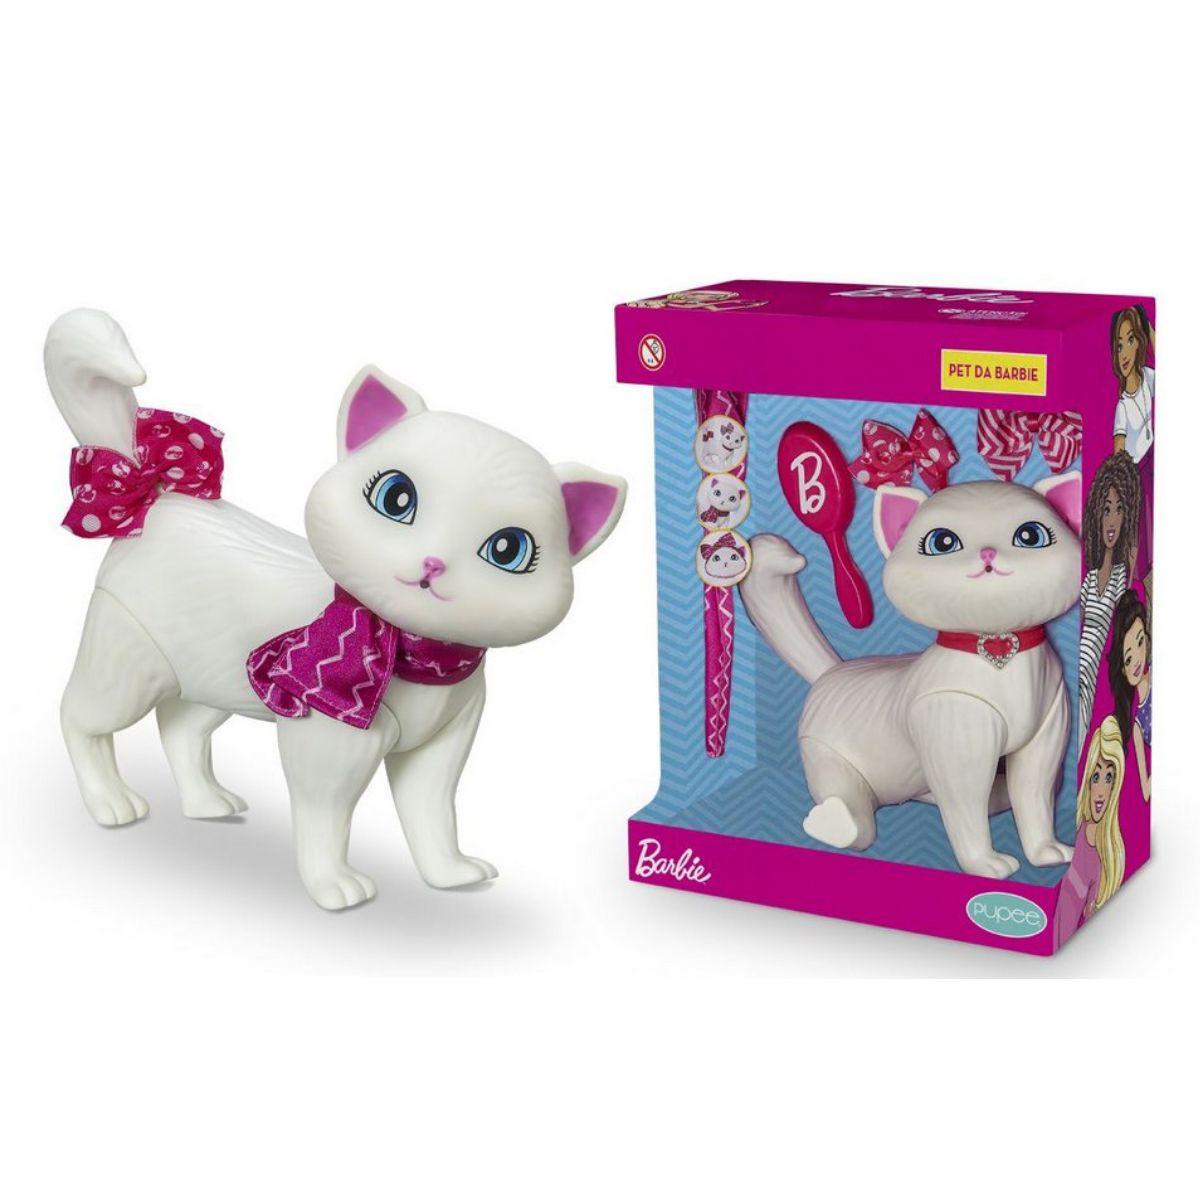 Blissa - Fashion - Pets da Barbie - Mattel